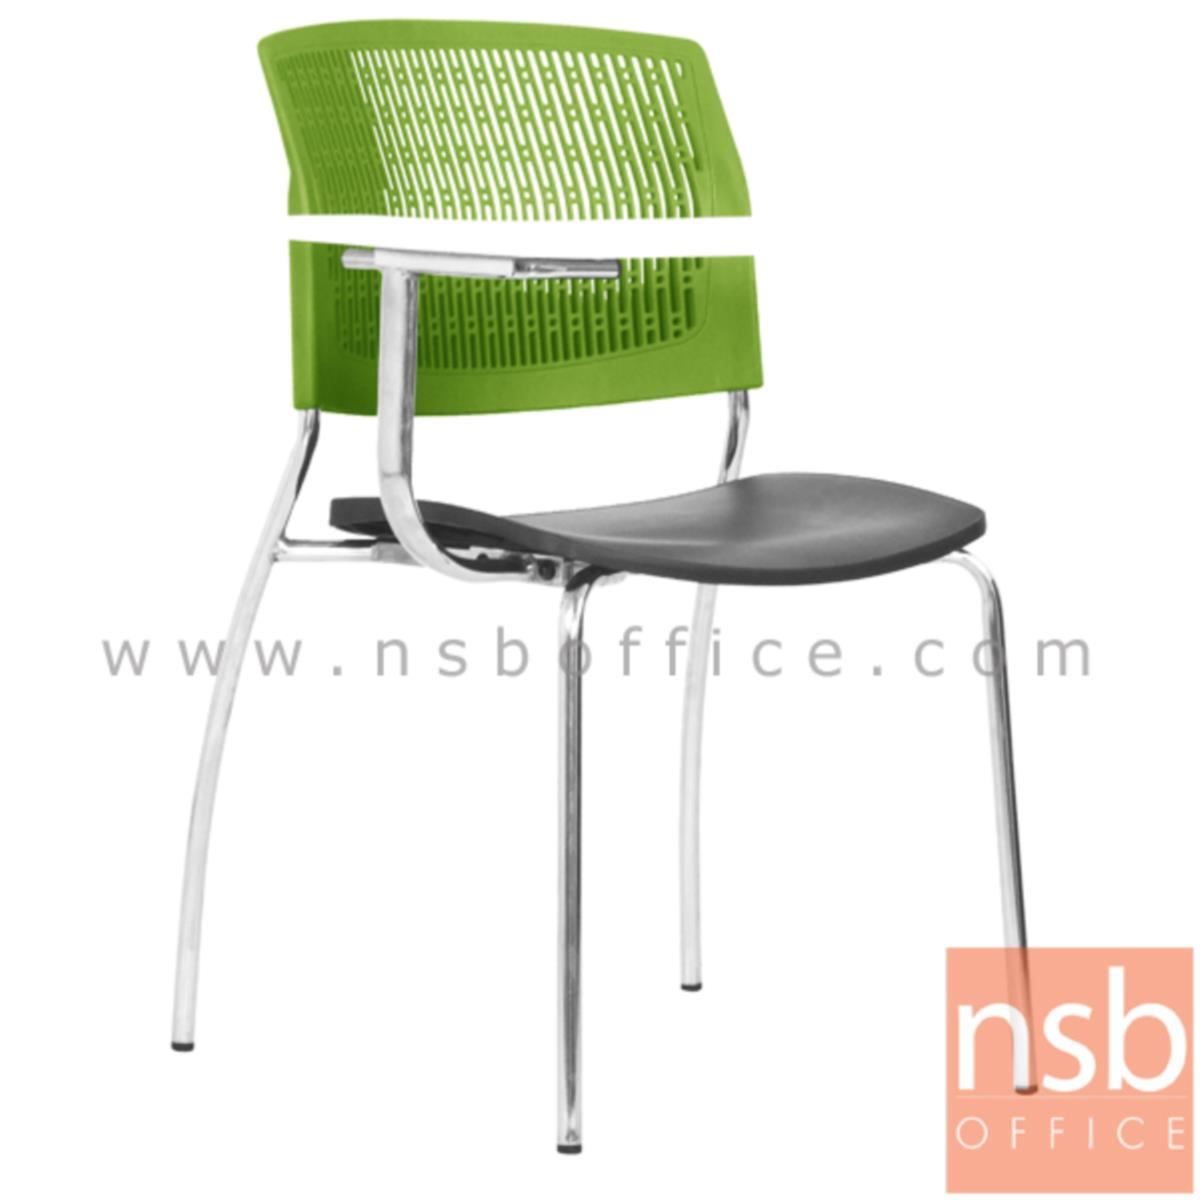 B07A081:เก้าอี้เลคเชอร์เฟรมโพลี่ รุ่น MOF1  ขาเหล็กชุบโครเมี่ยม